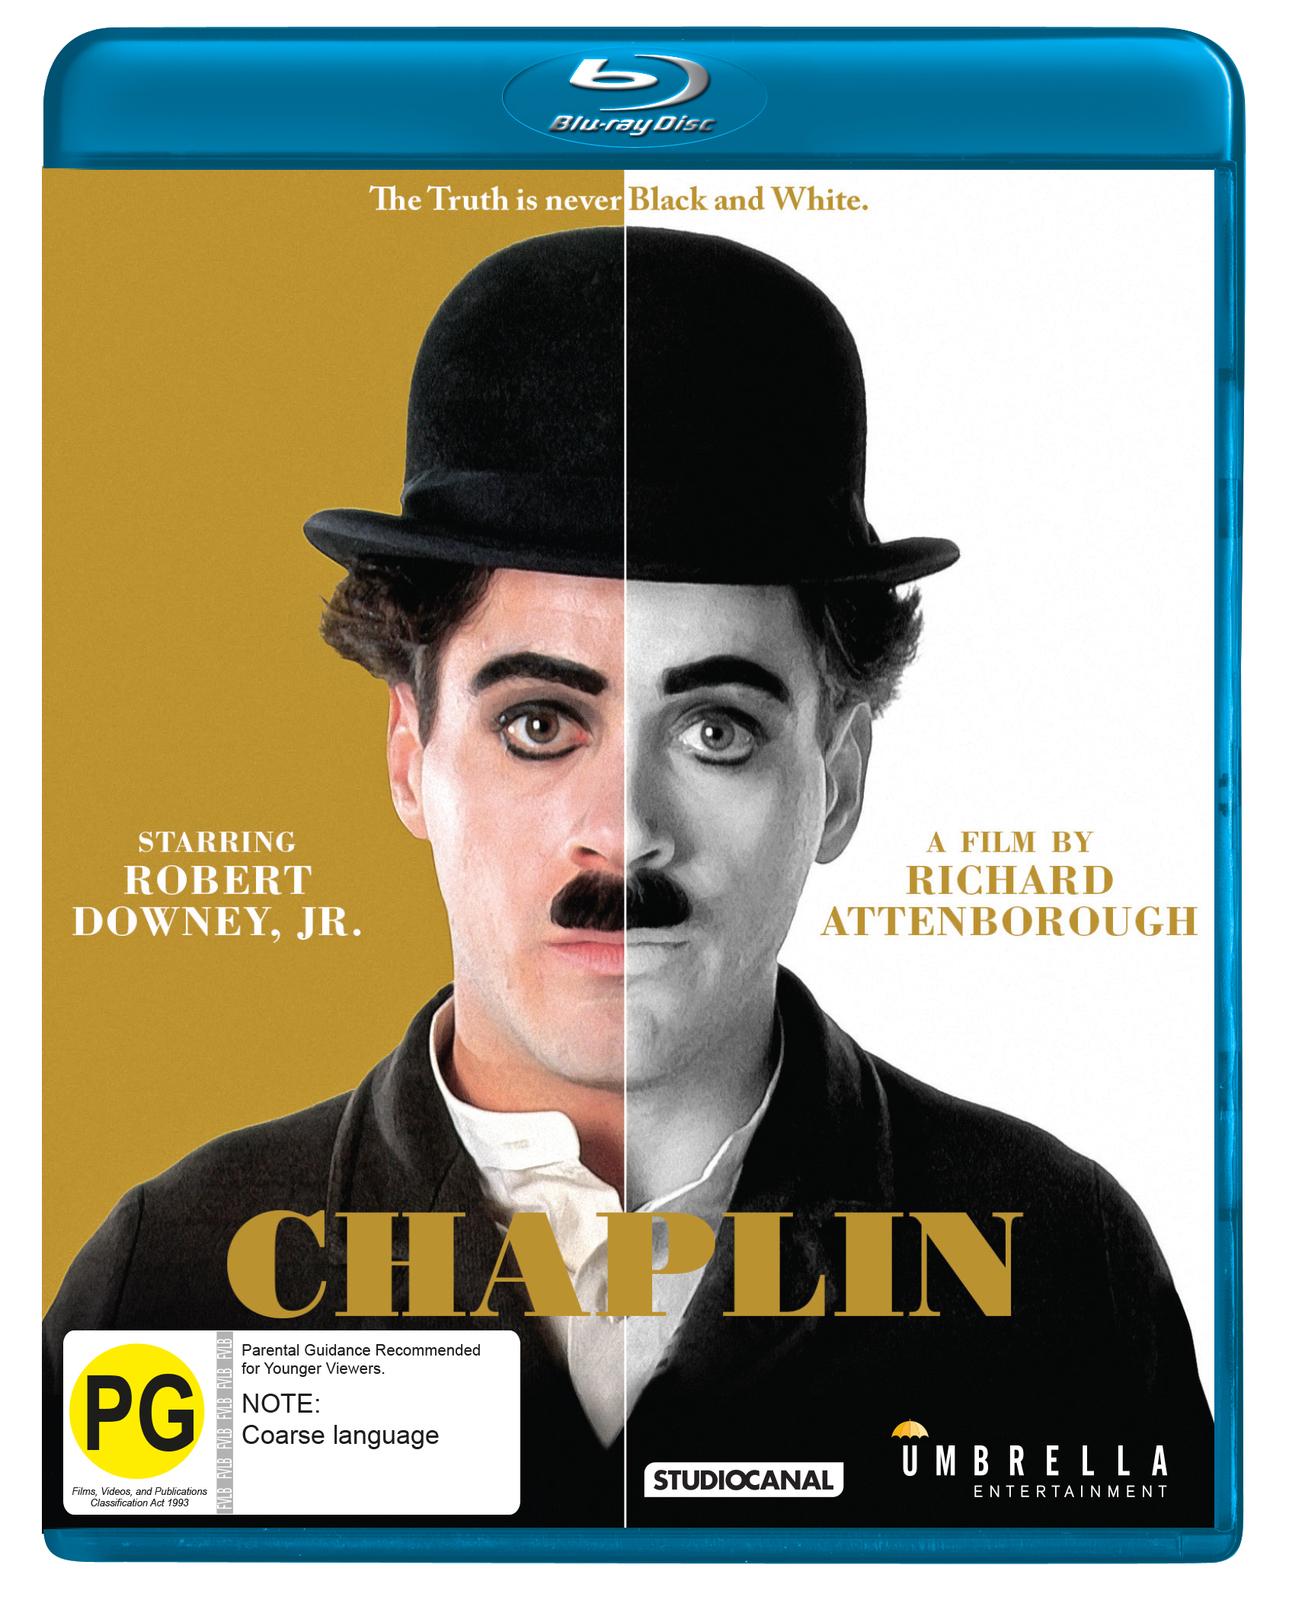 Chaplin on Blu-ray image